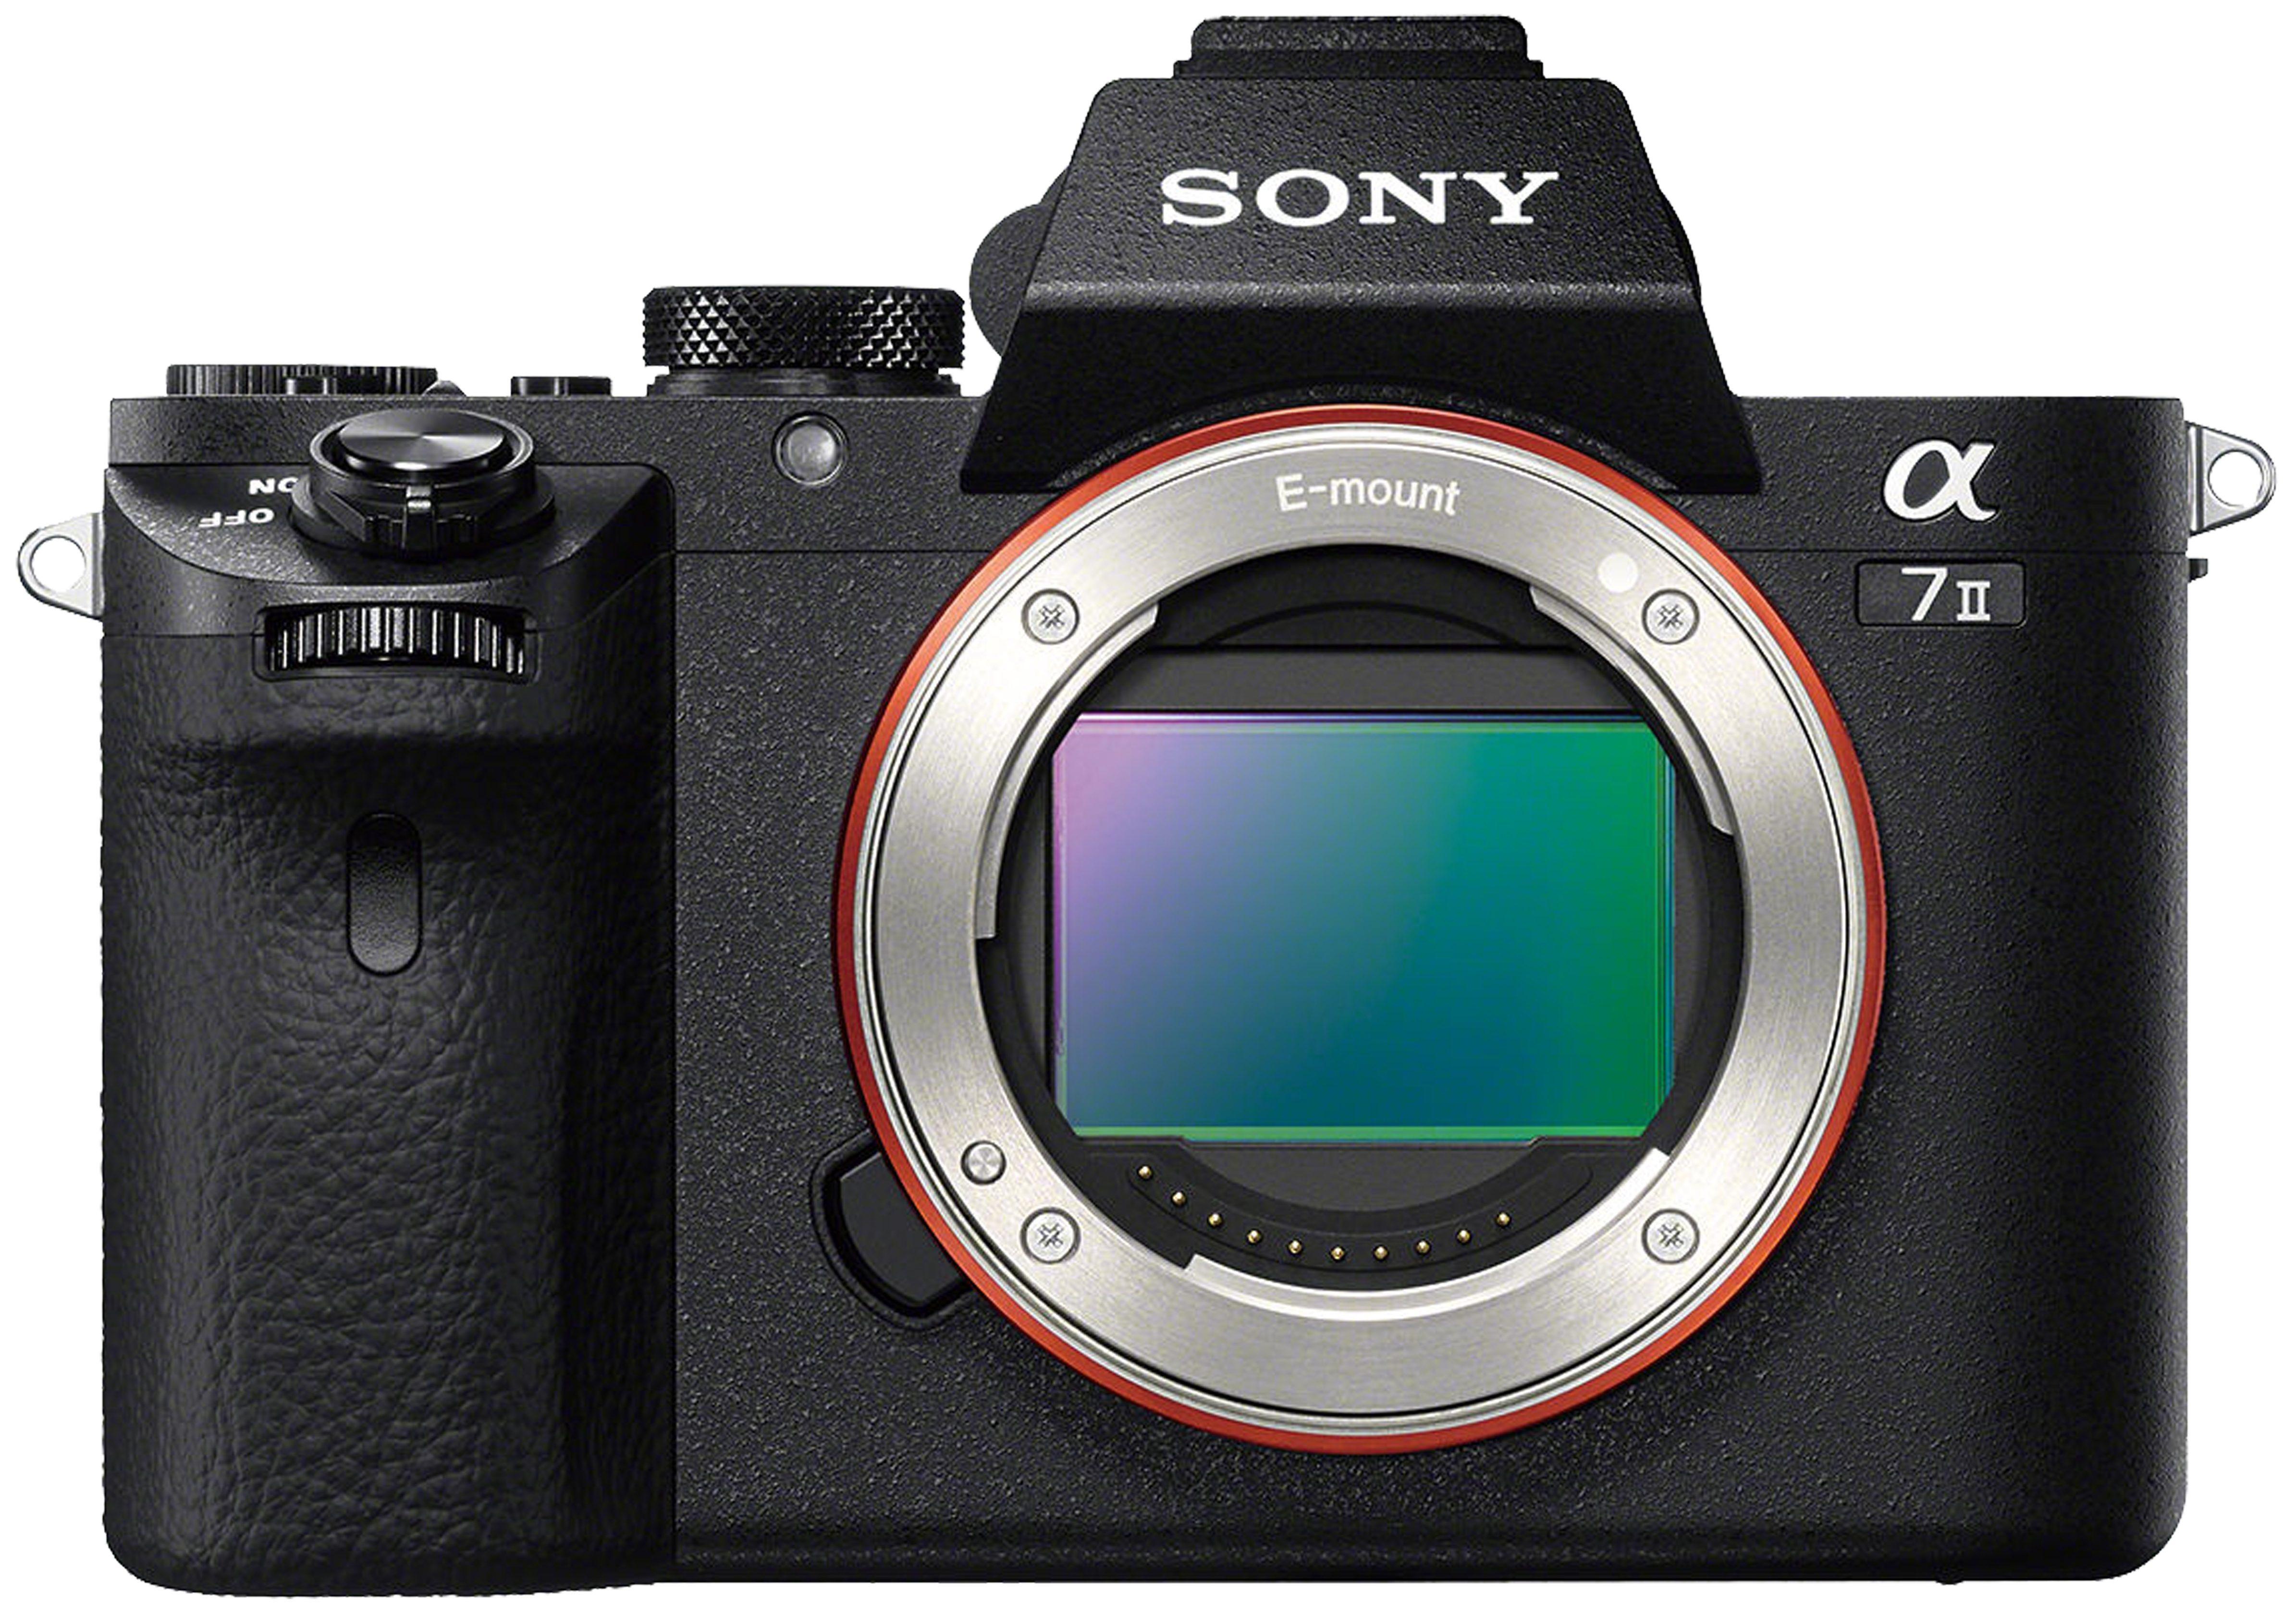 Sony Alpha ILCE-7M2 Body System Kamera, 24,3 Megapixel, 7,5 cm (3 Zoll) Display